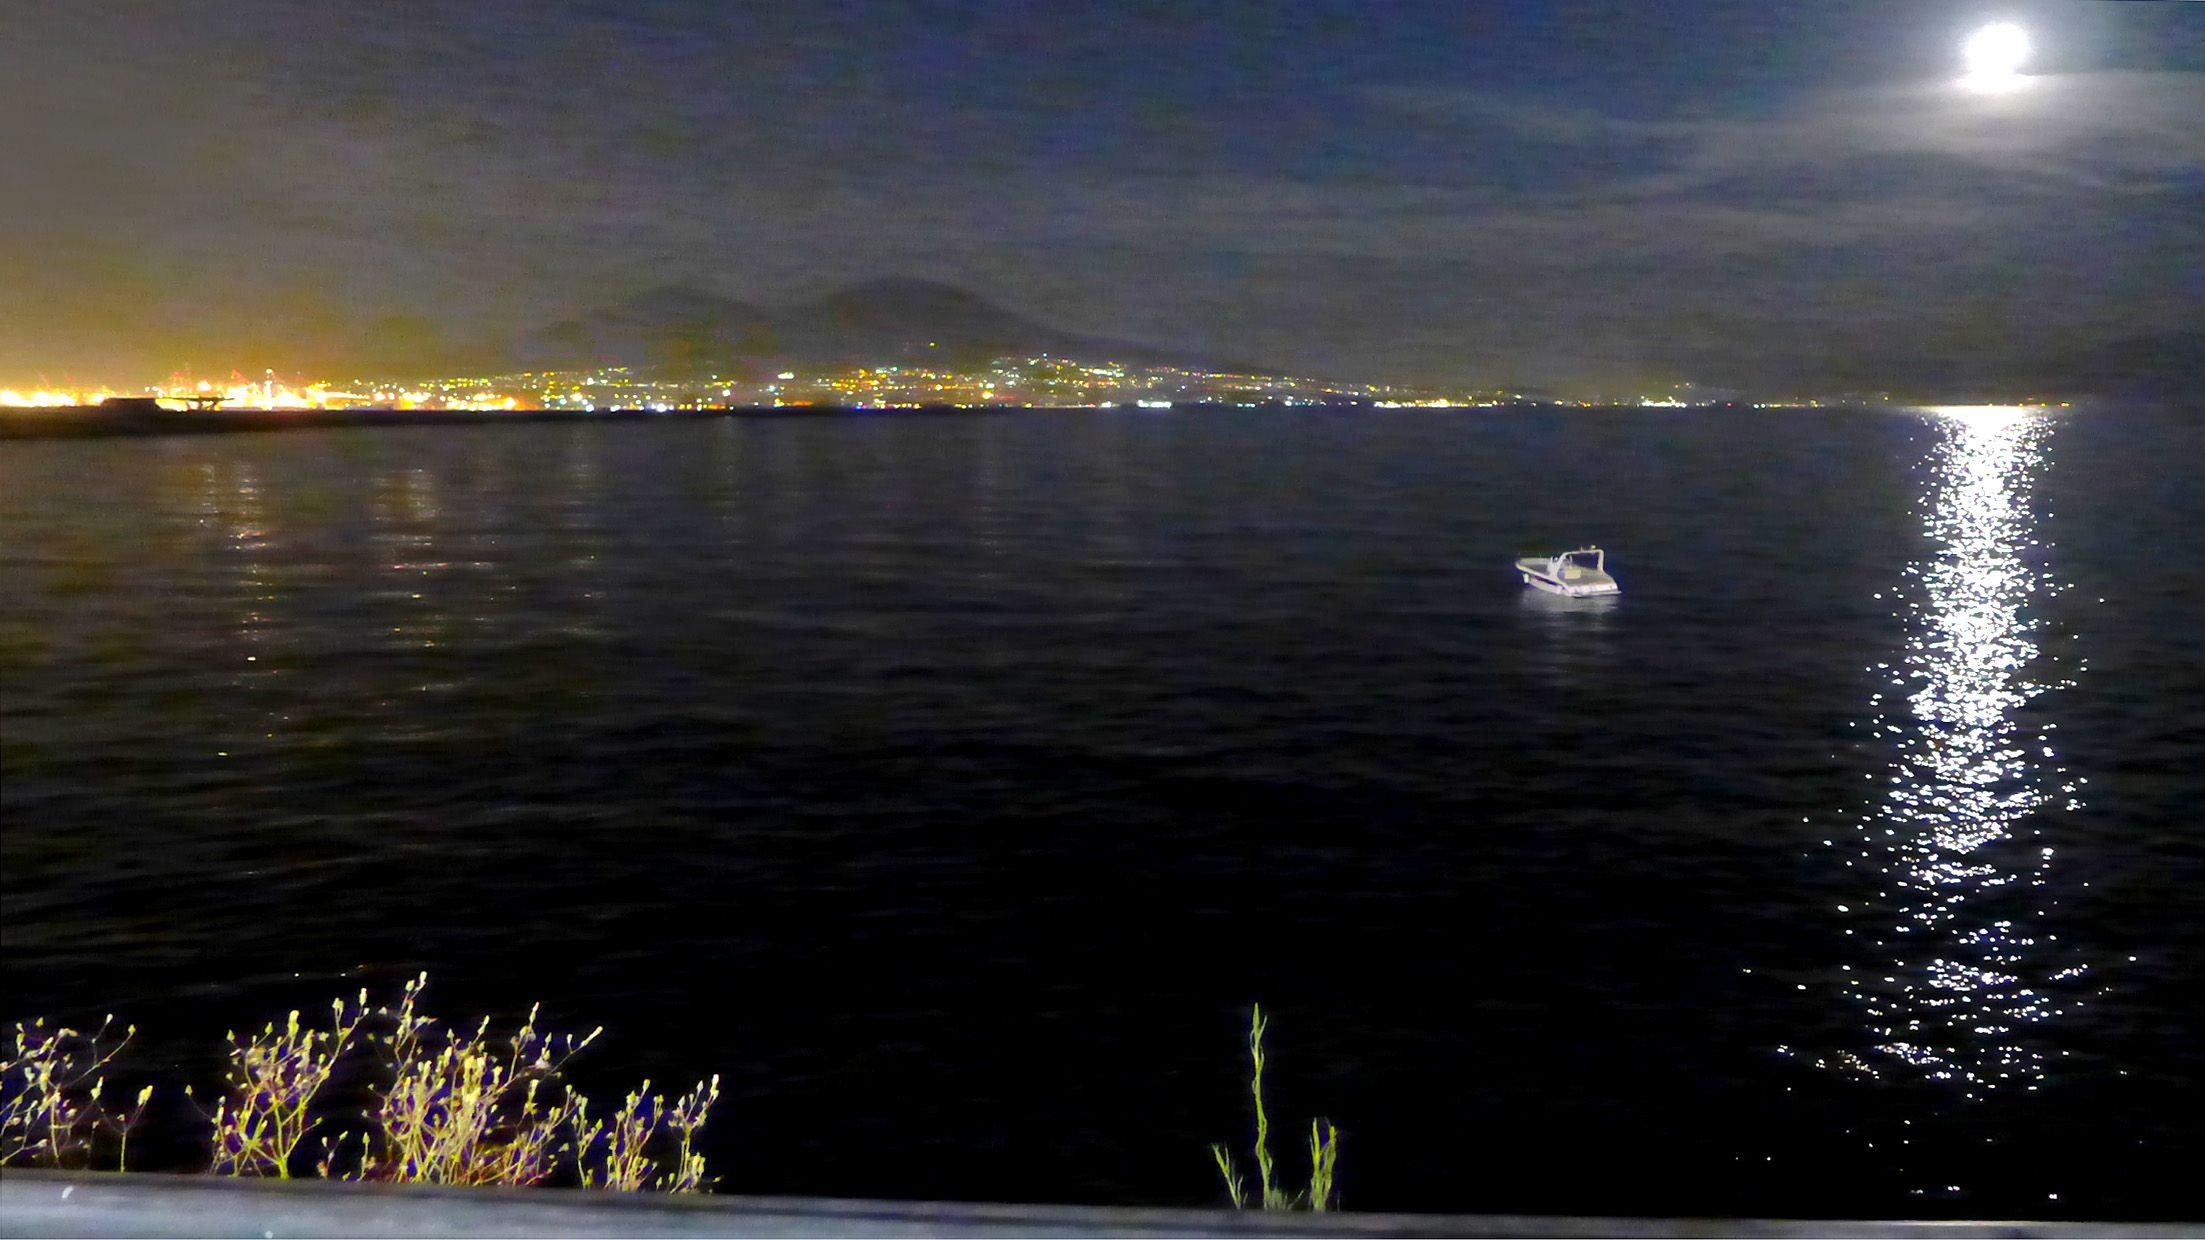 Napoli 150602-2135 by Schoendy